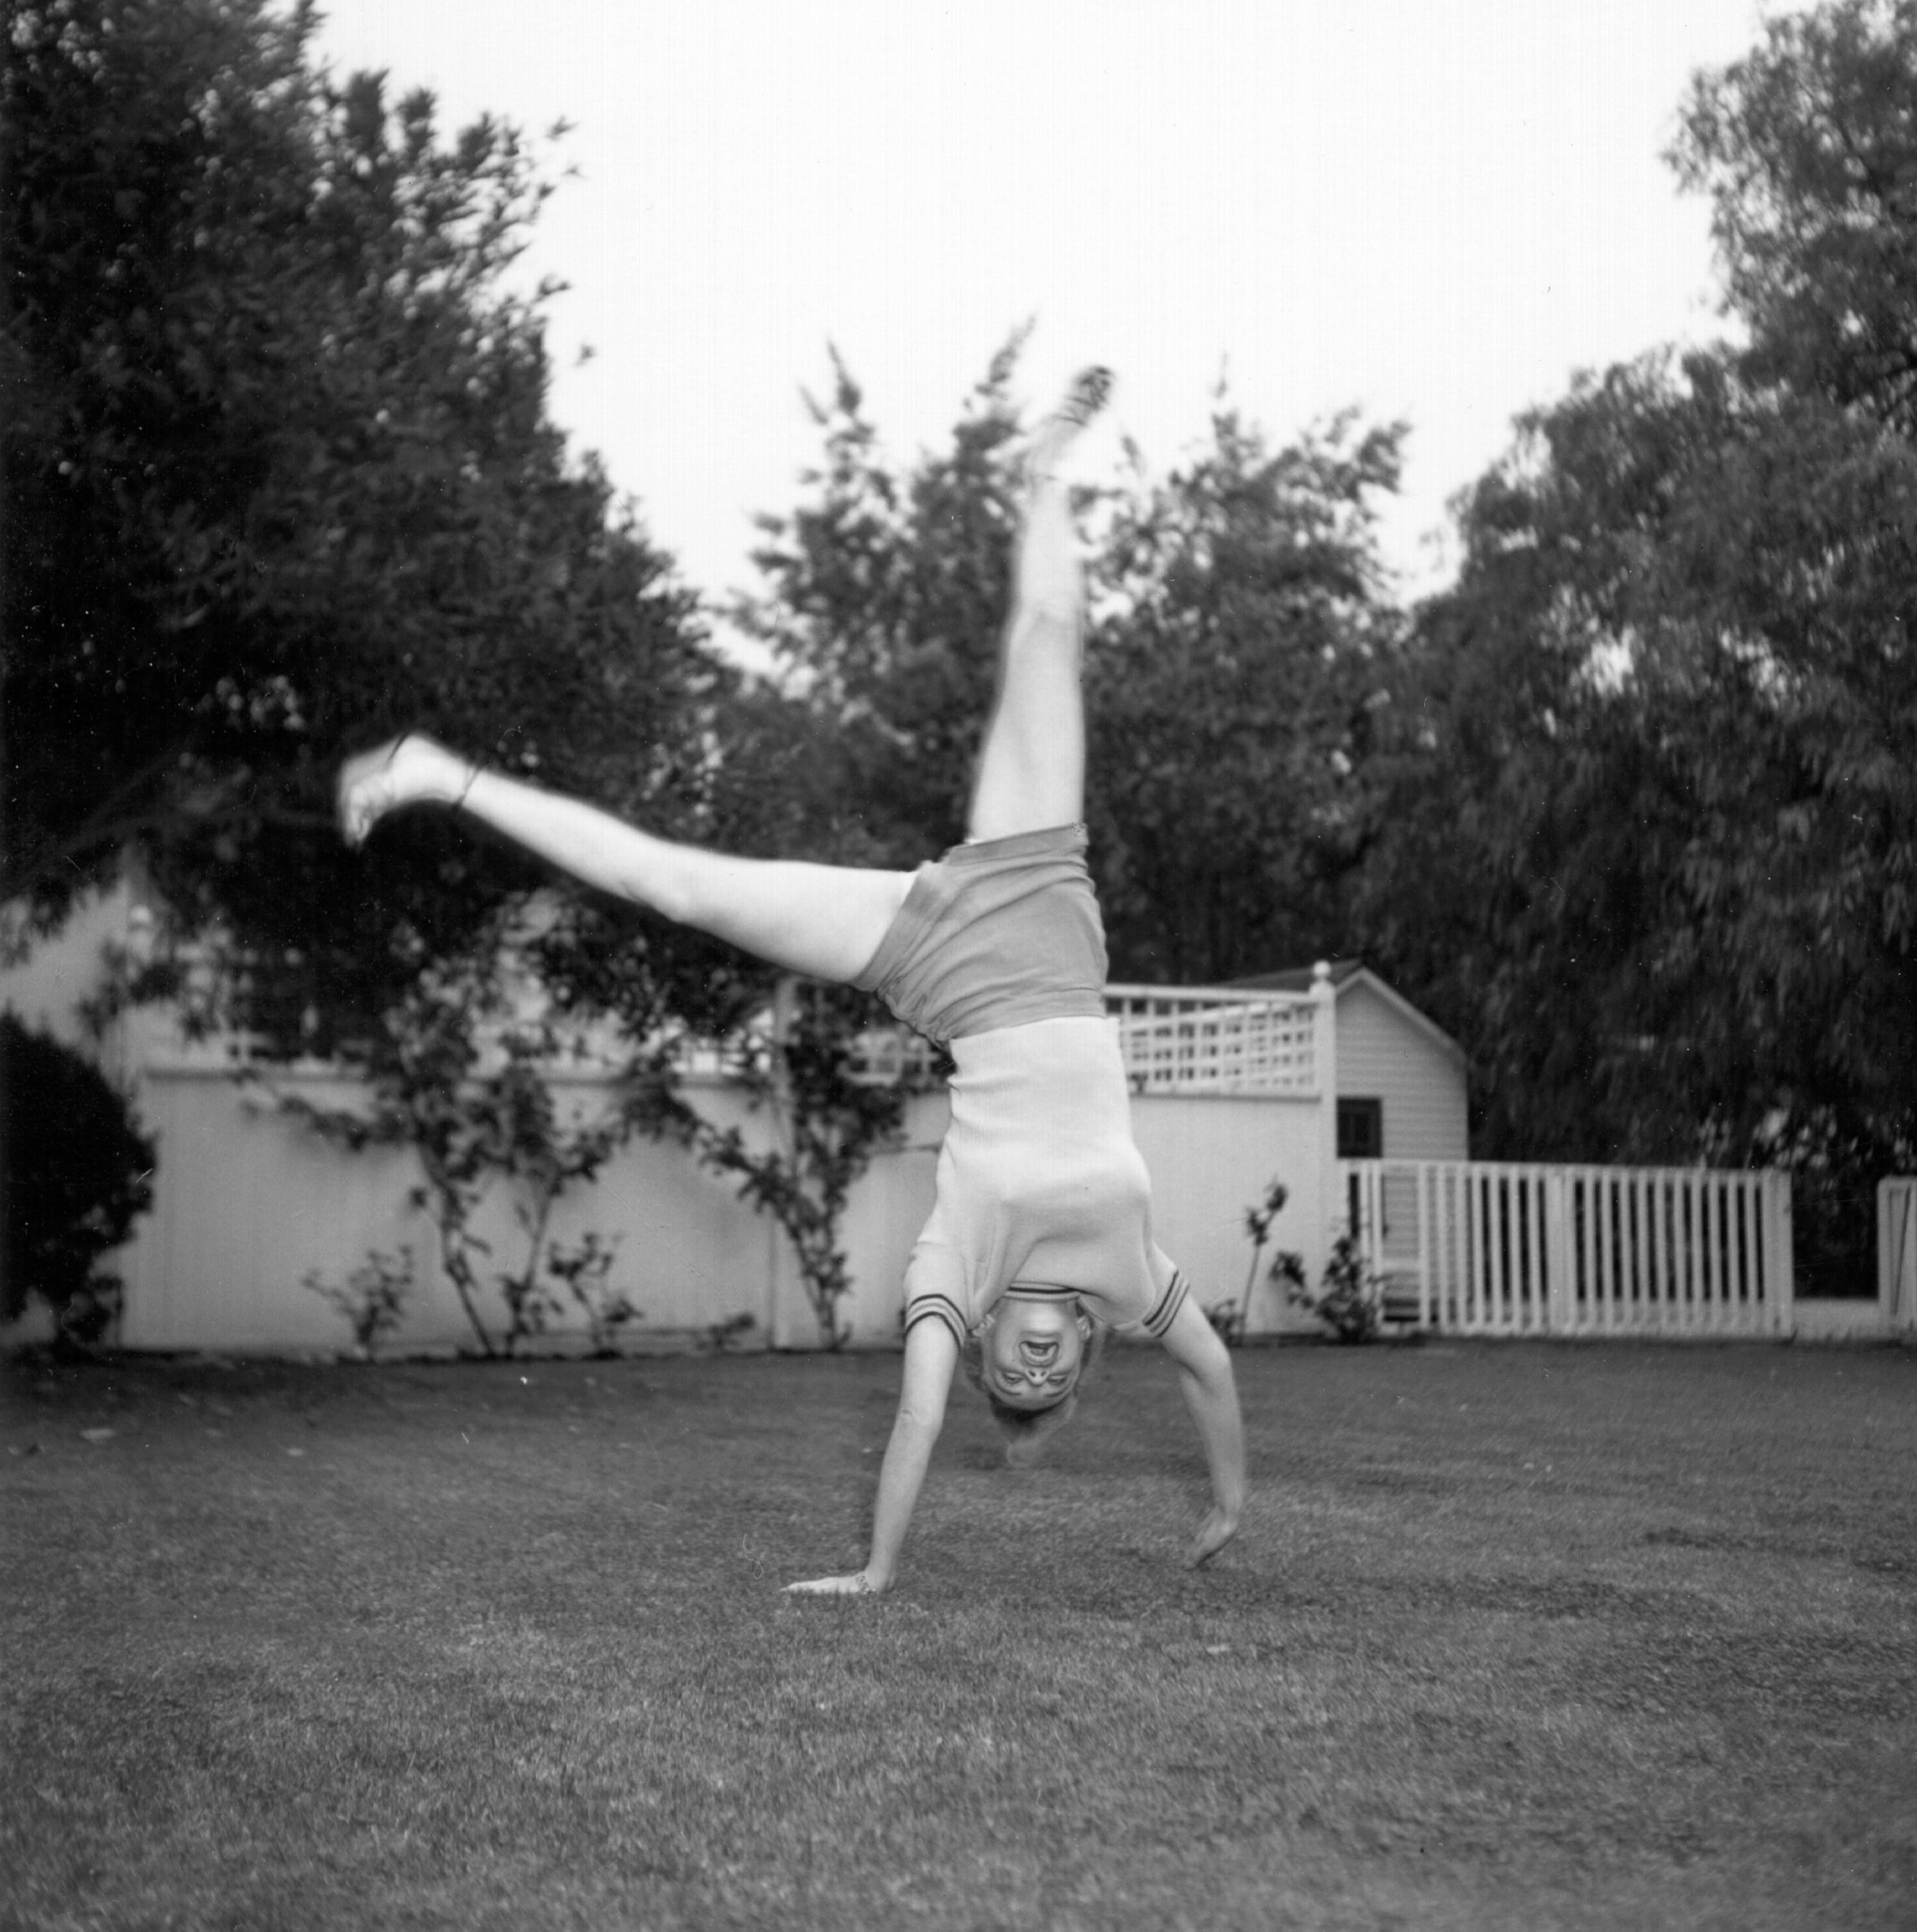 Marilyn Monroe doing a cartwheel